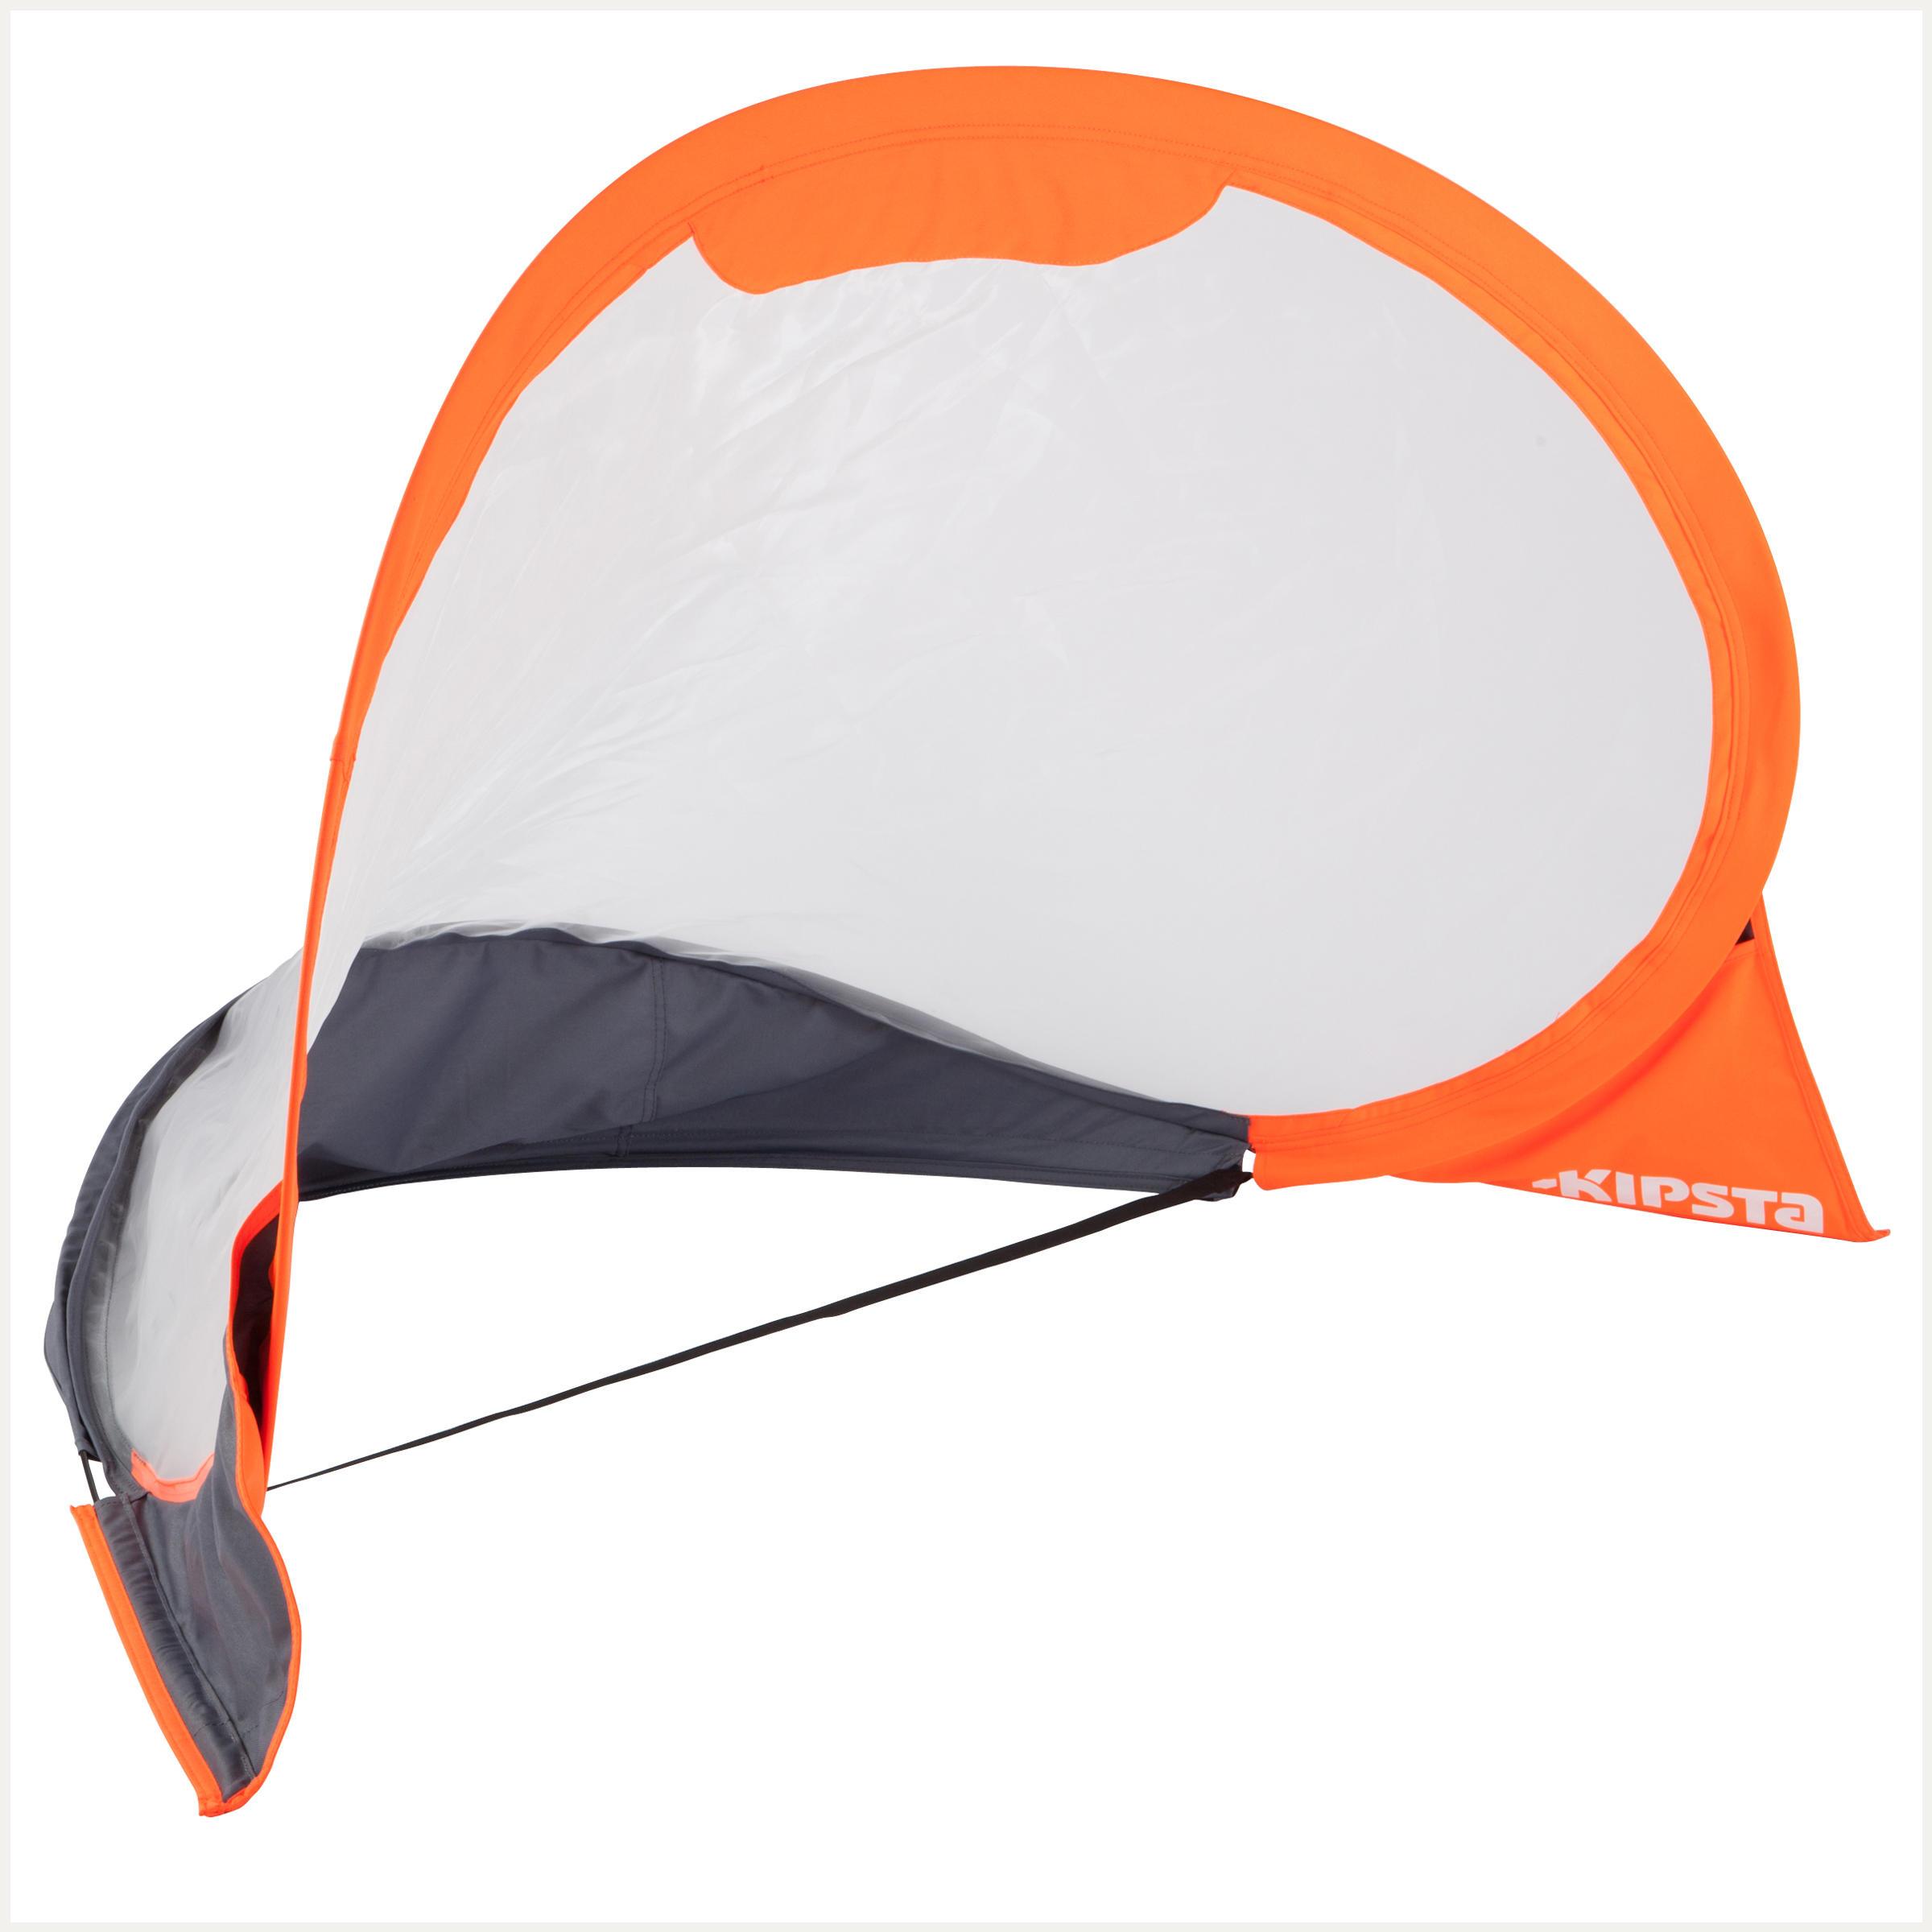 Kipsta Voetbaldoeltje pop-up The Kage Easy Folding grijs/oranje